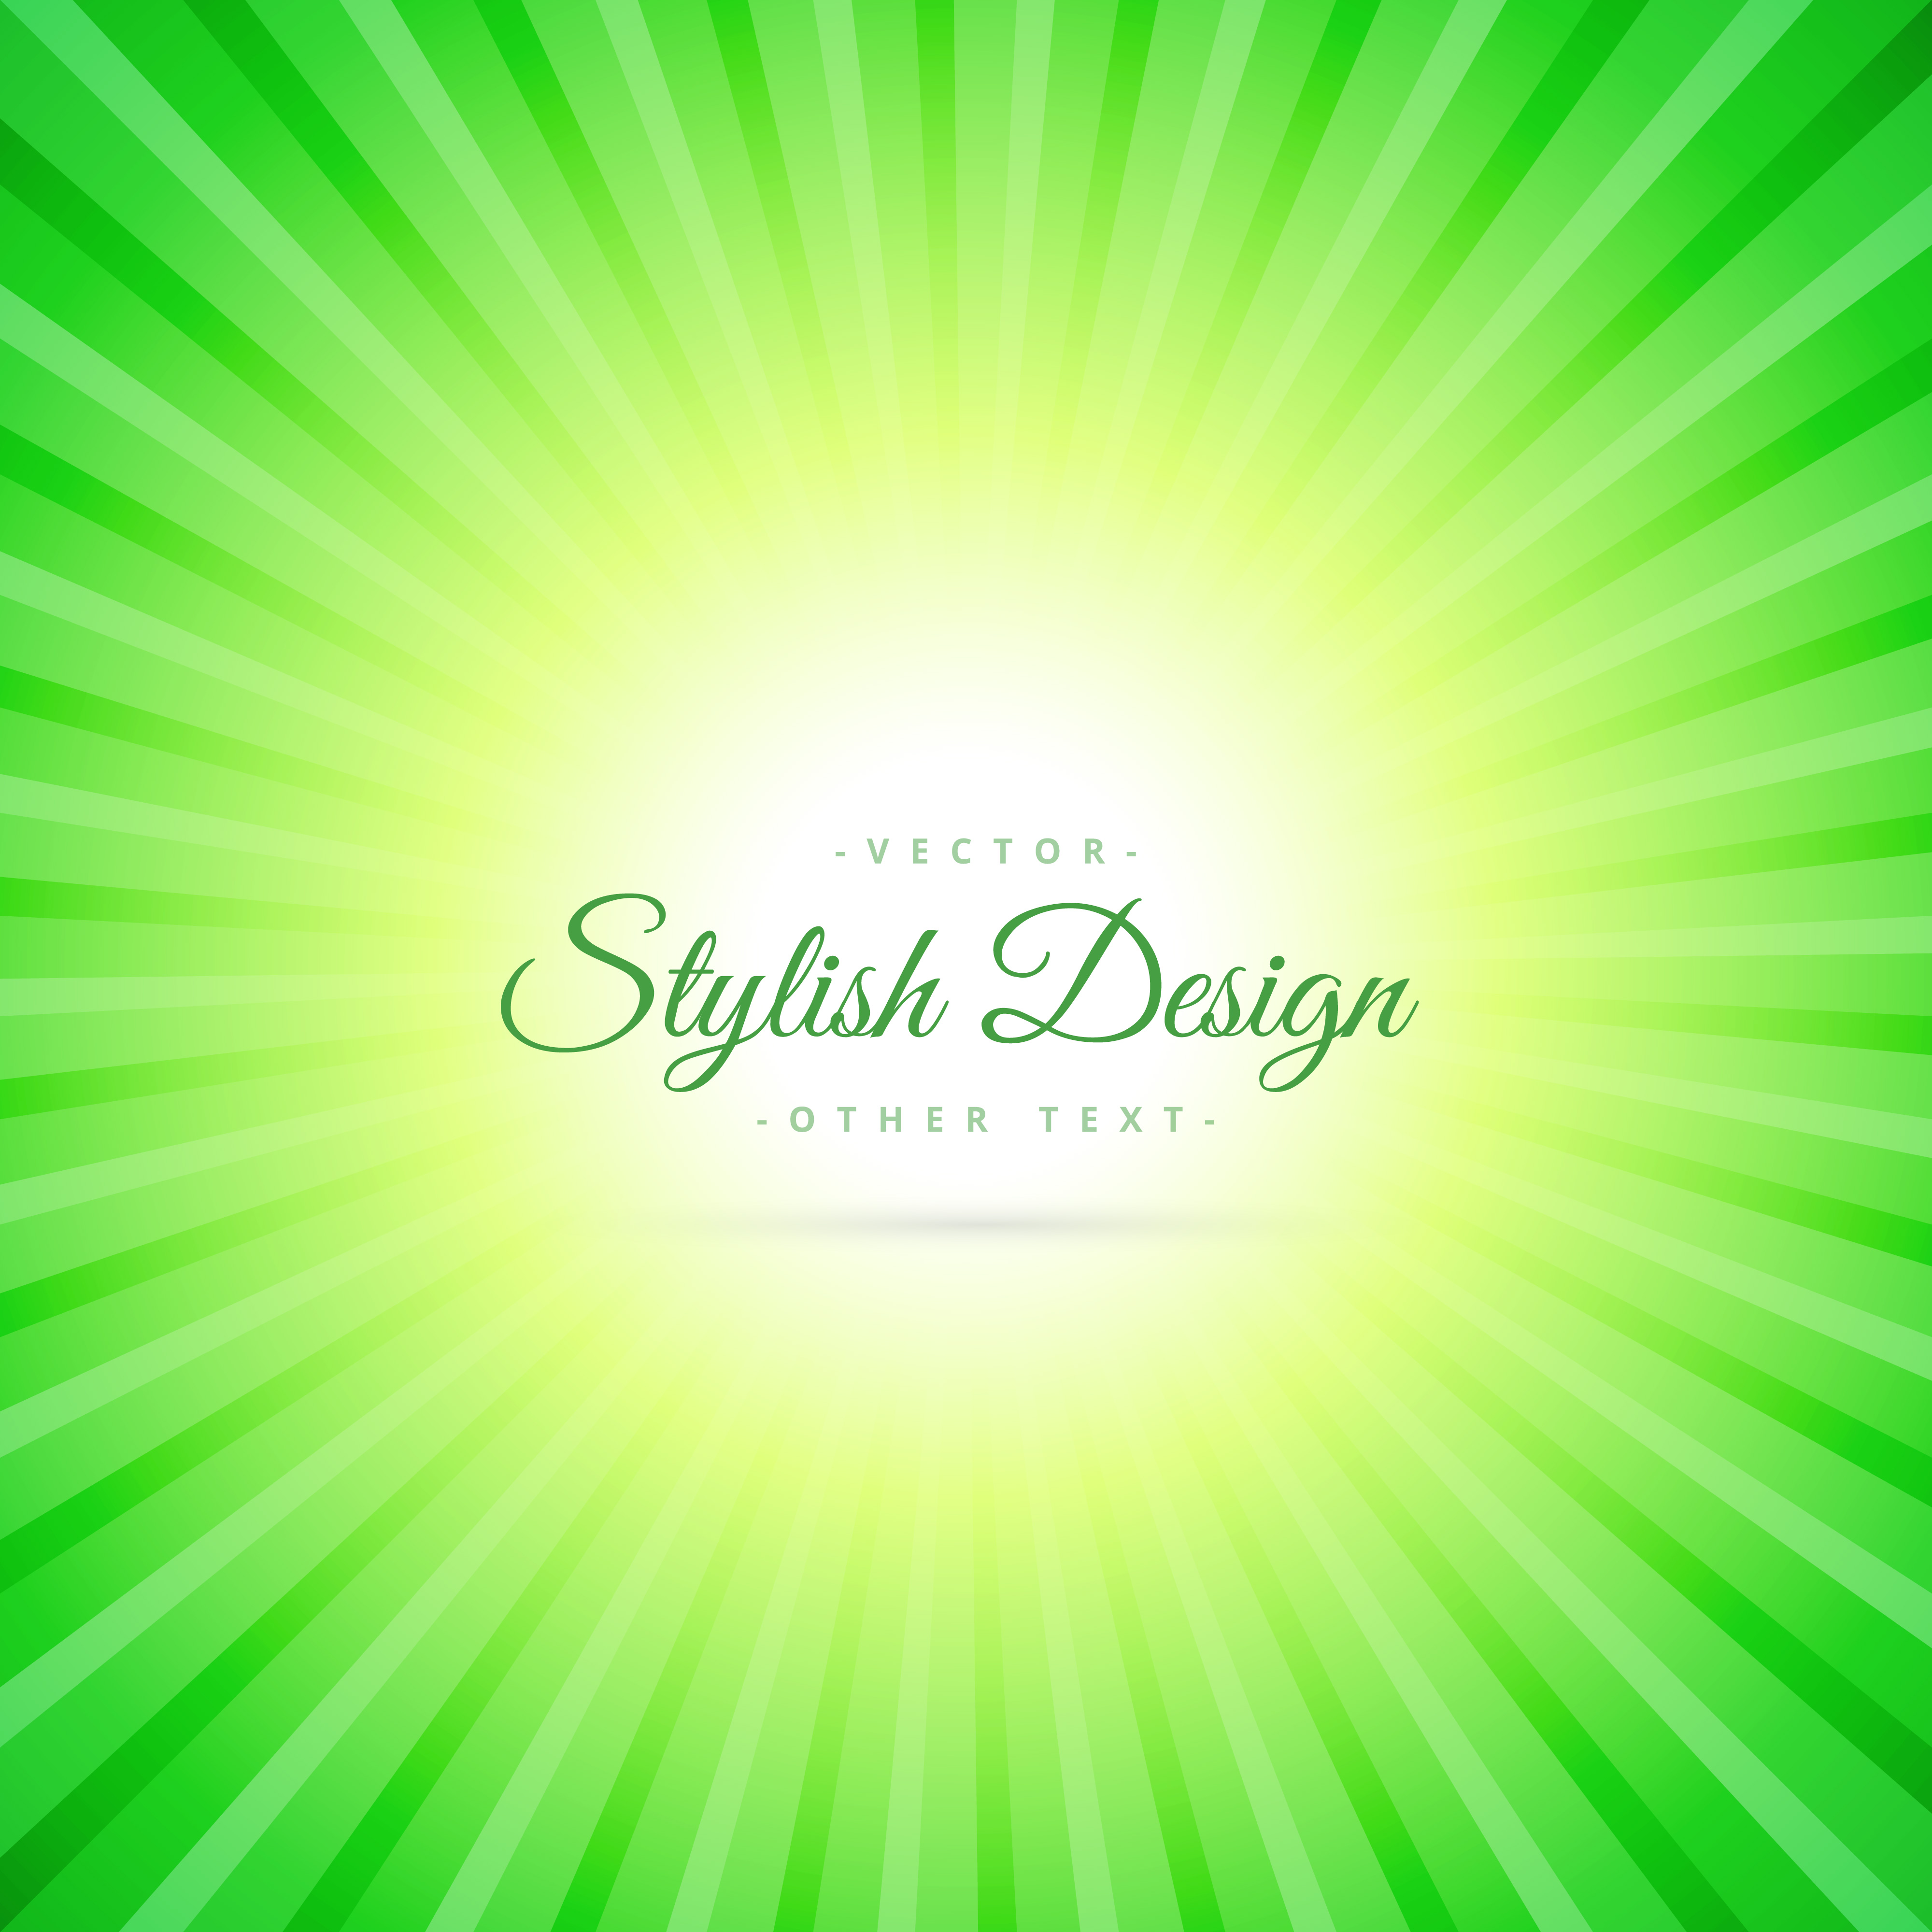 Green Sunburst Background Download Free Vector Art